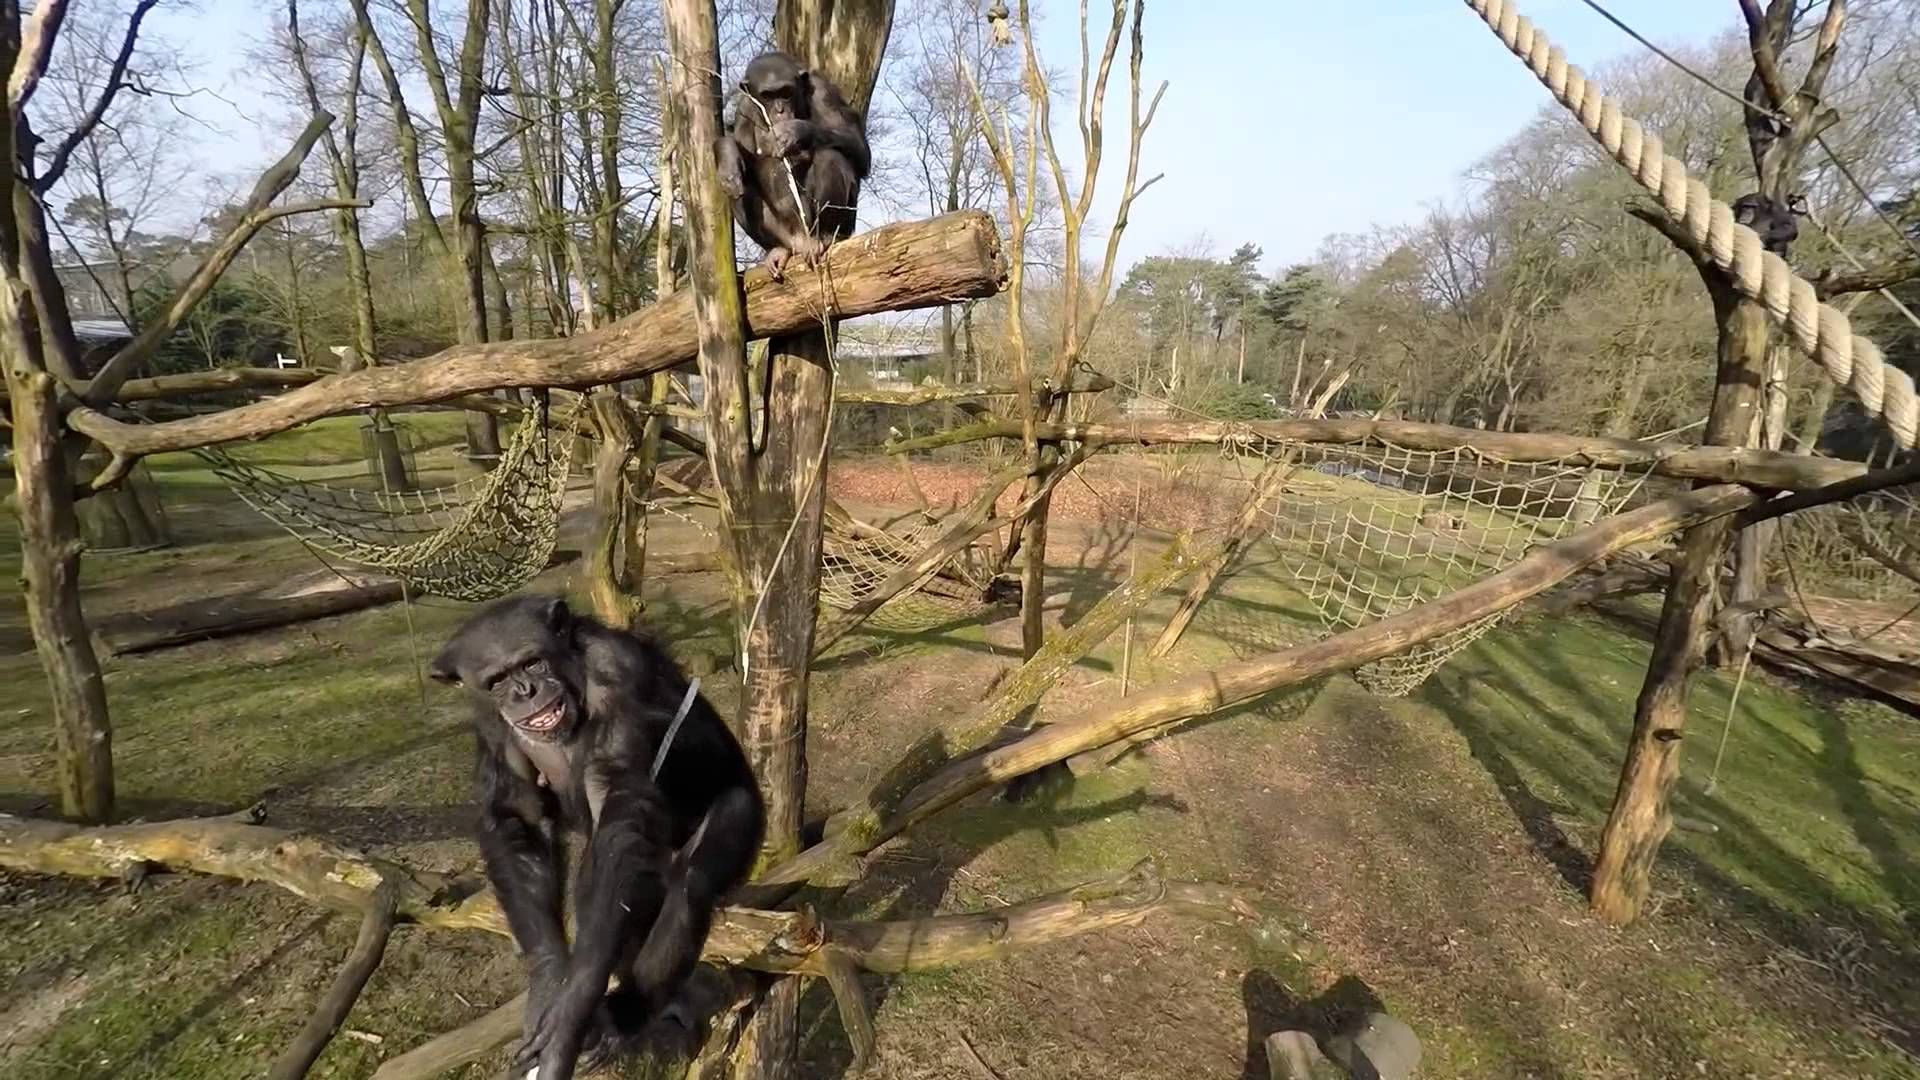 Šimpanz brutálně zaútočil na kameru!